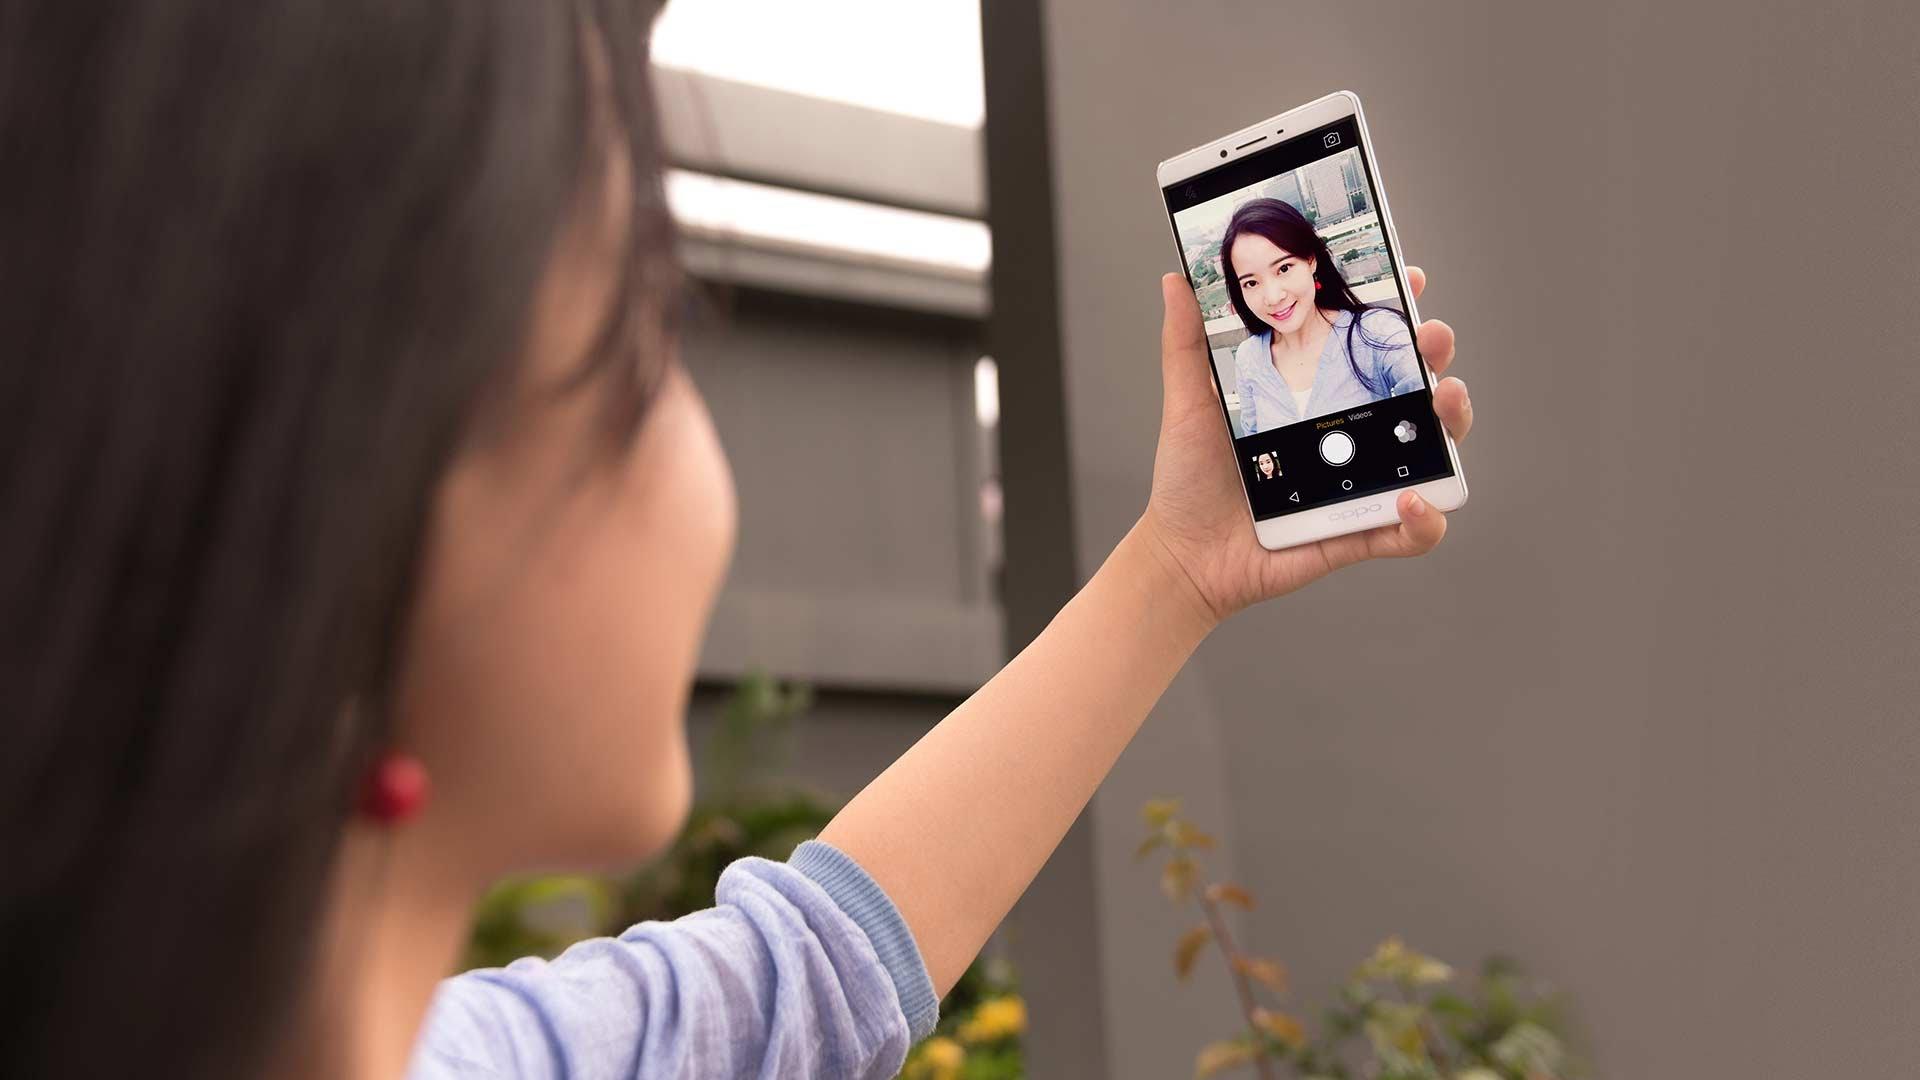 Oppo F1s cho khả năng selfie tuyệt vời